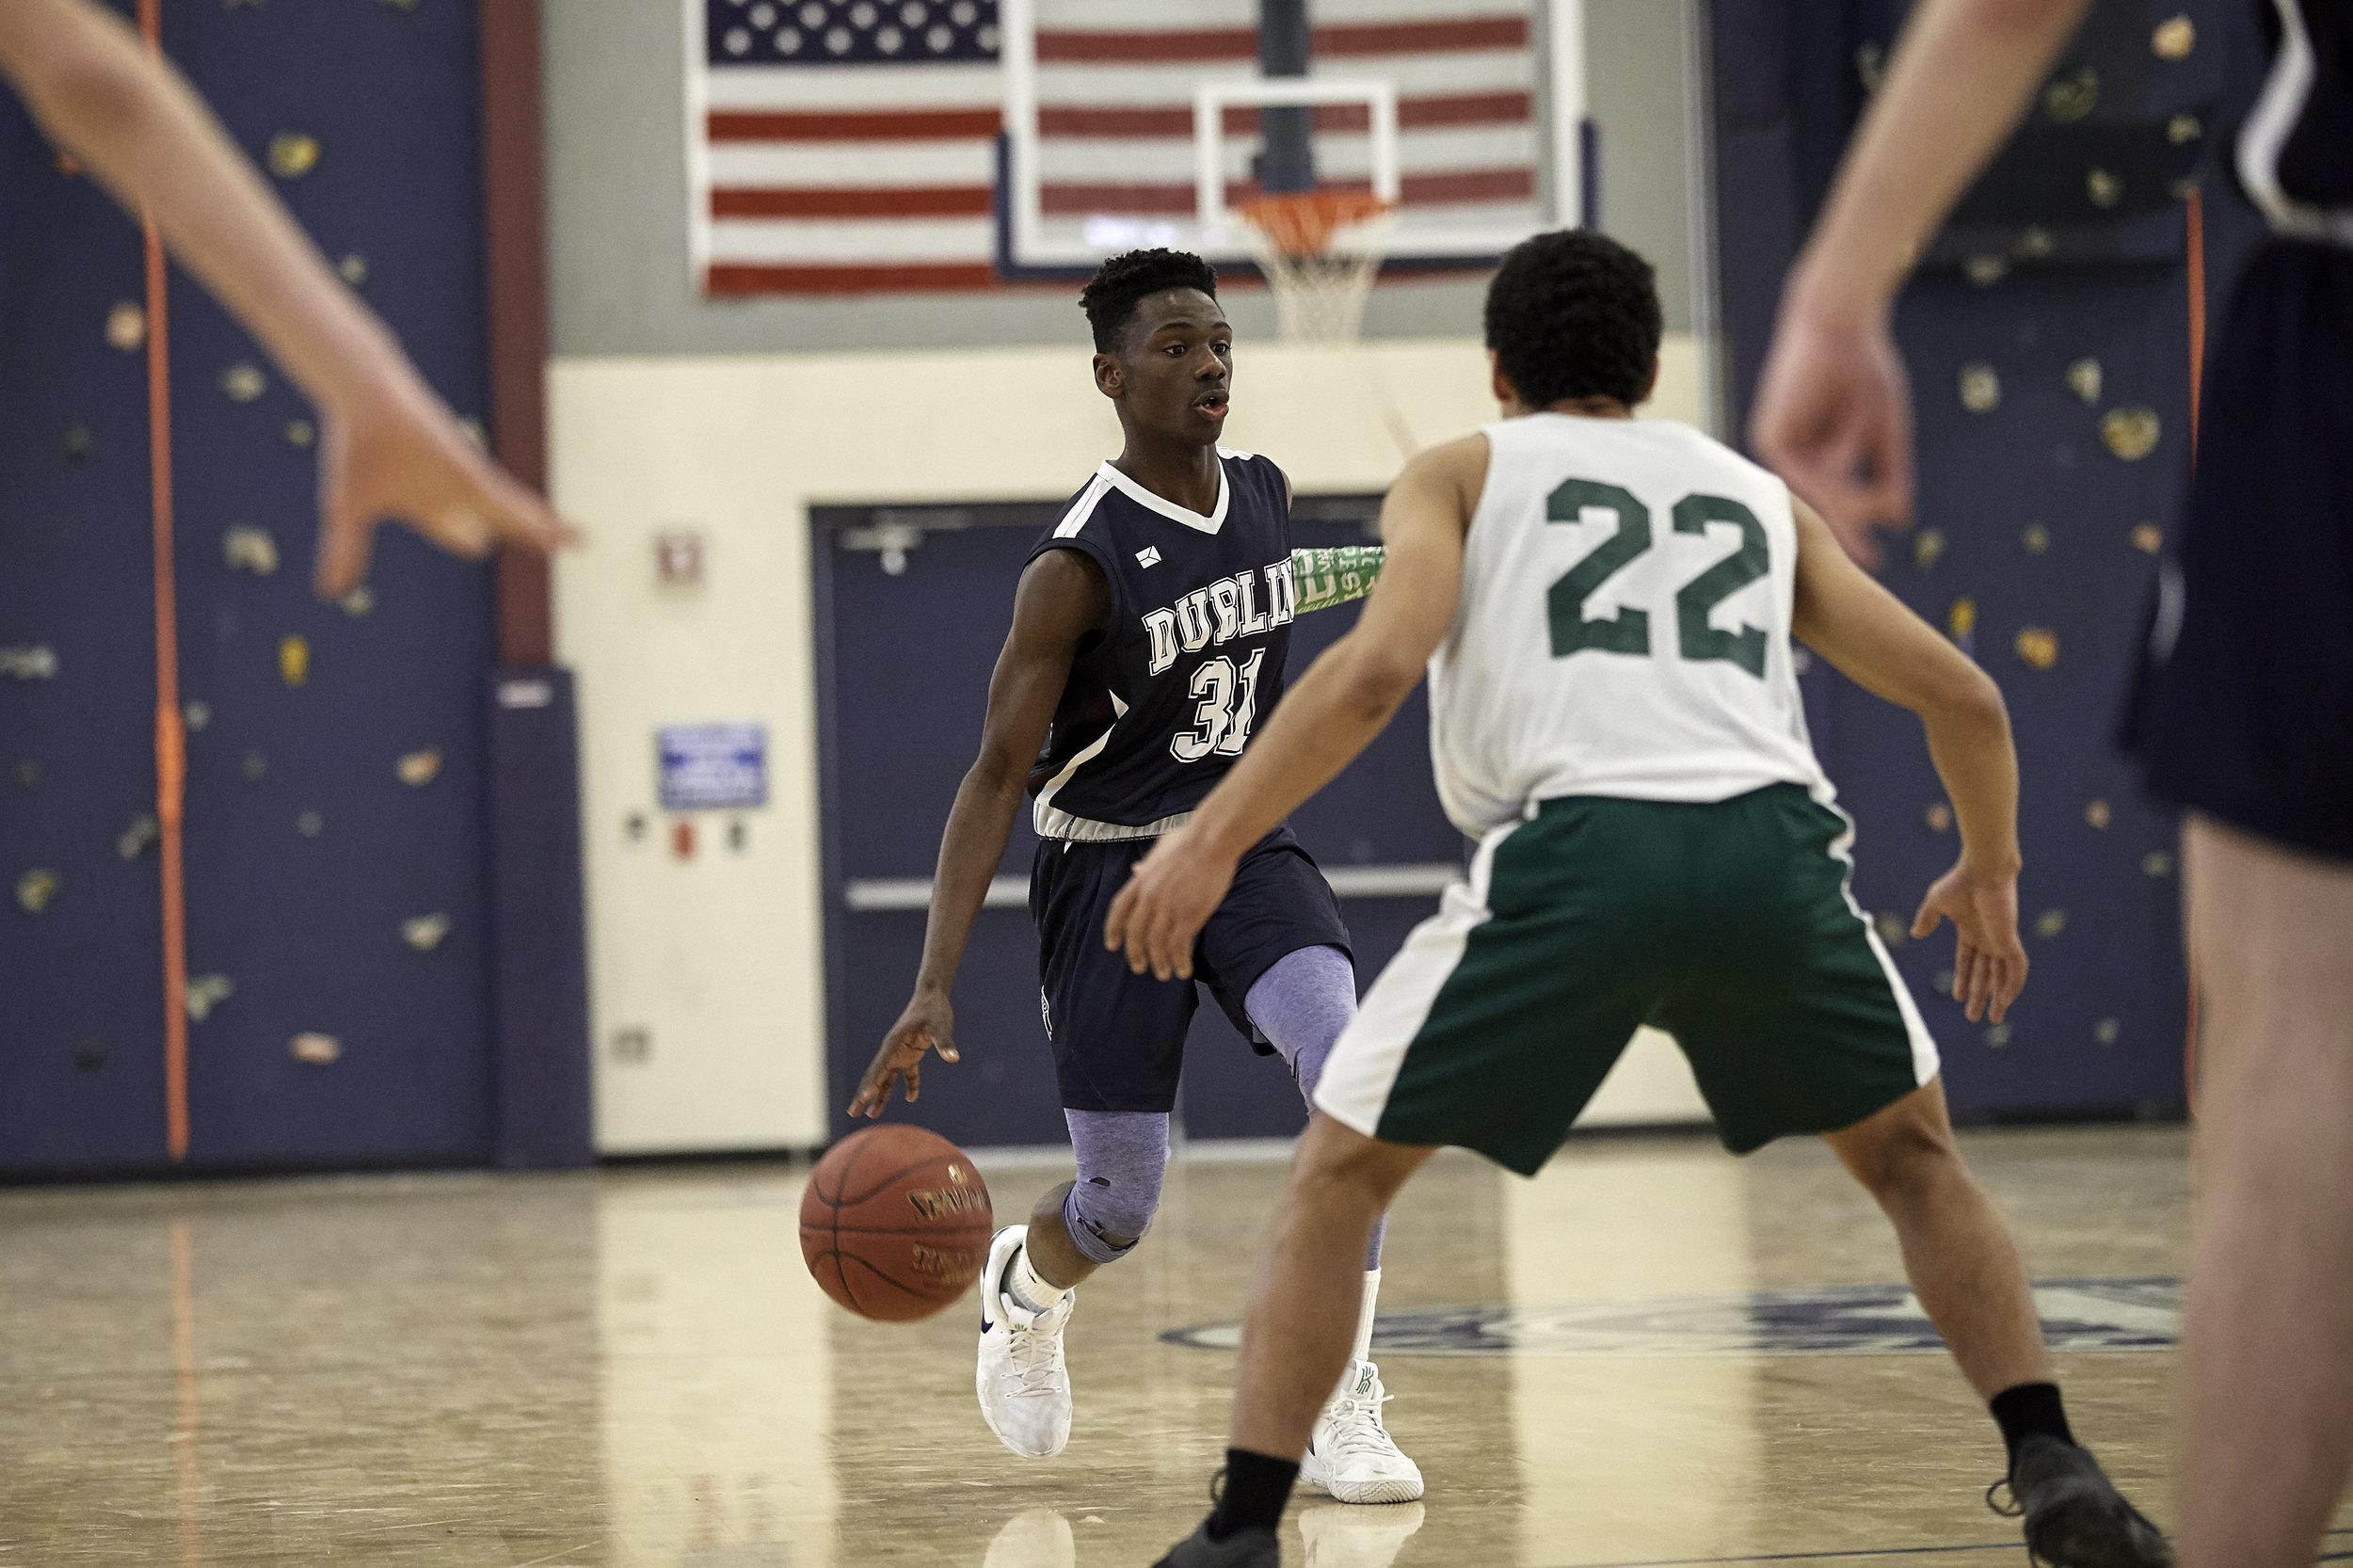 Boys Varsity Basketball vs High Mowing School - Feb 02 2019 - 0005.jpg